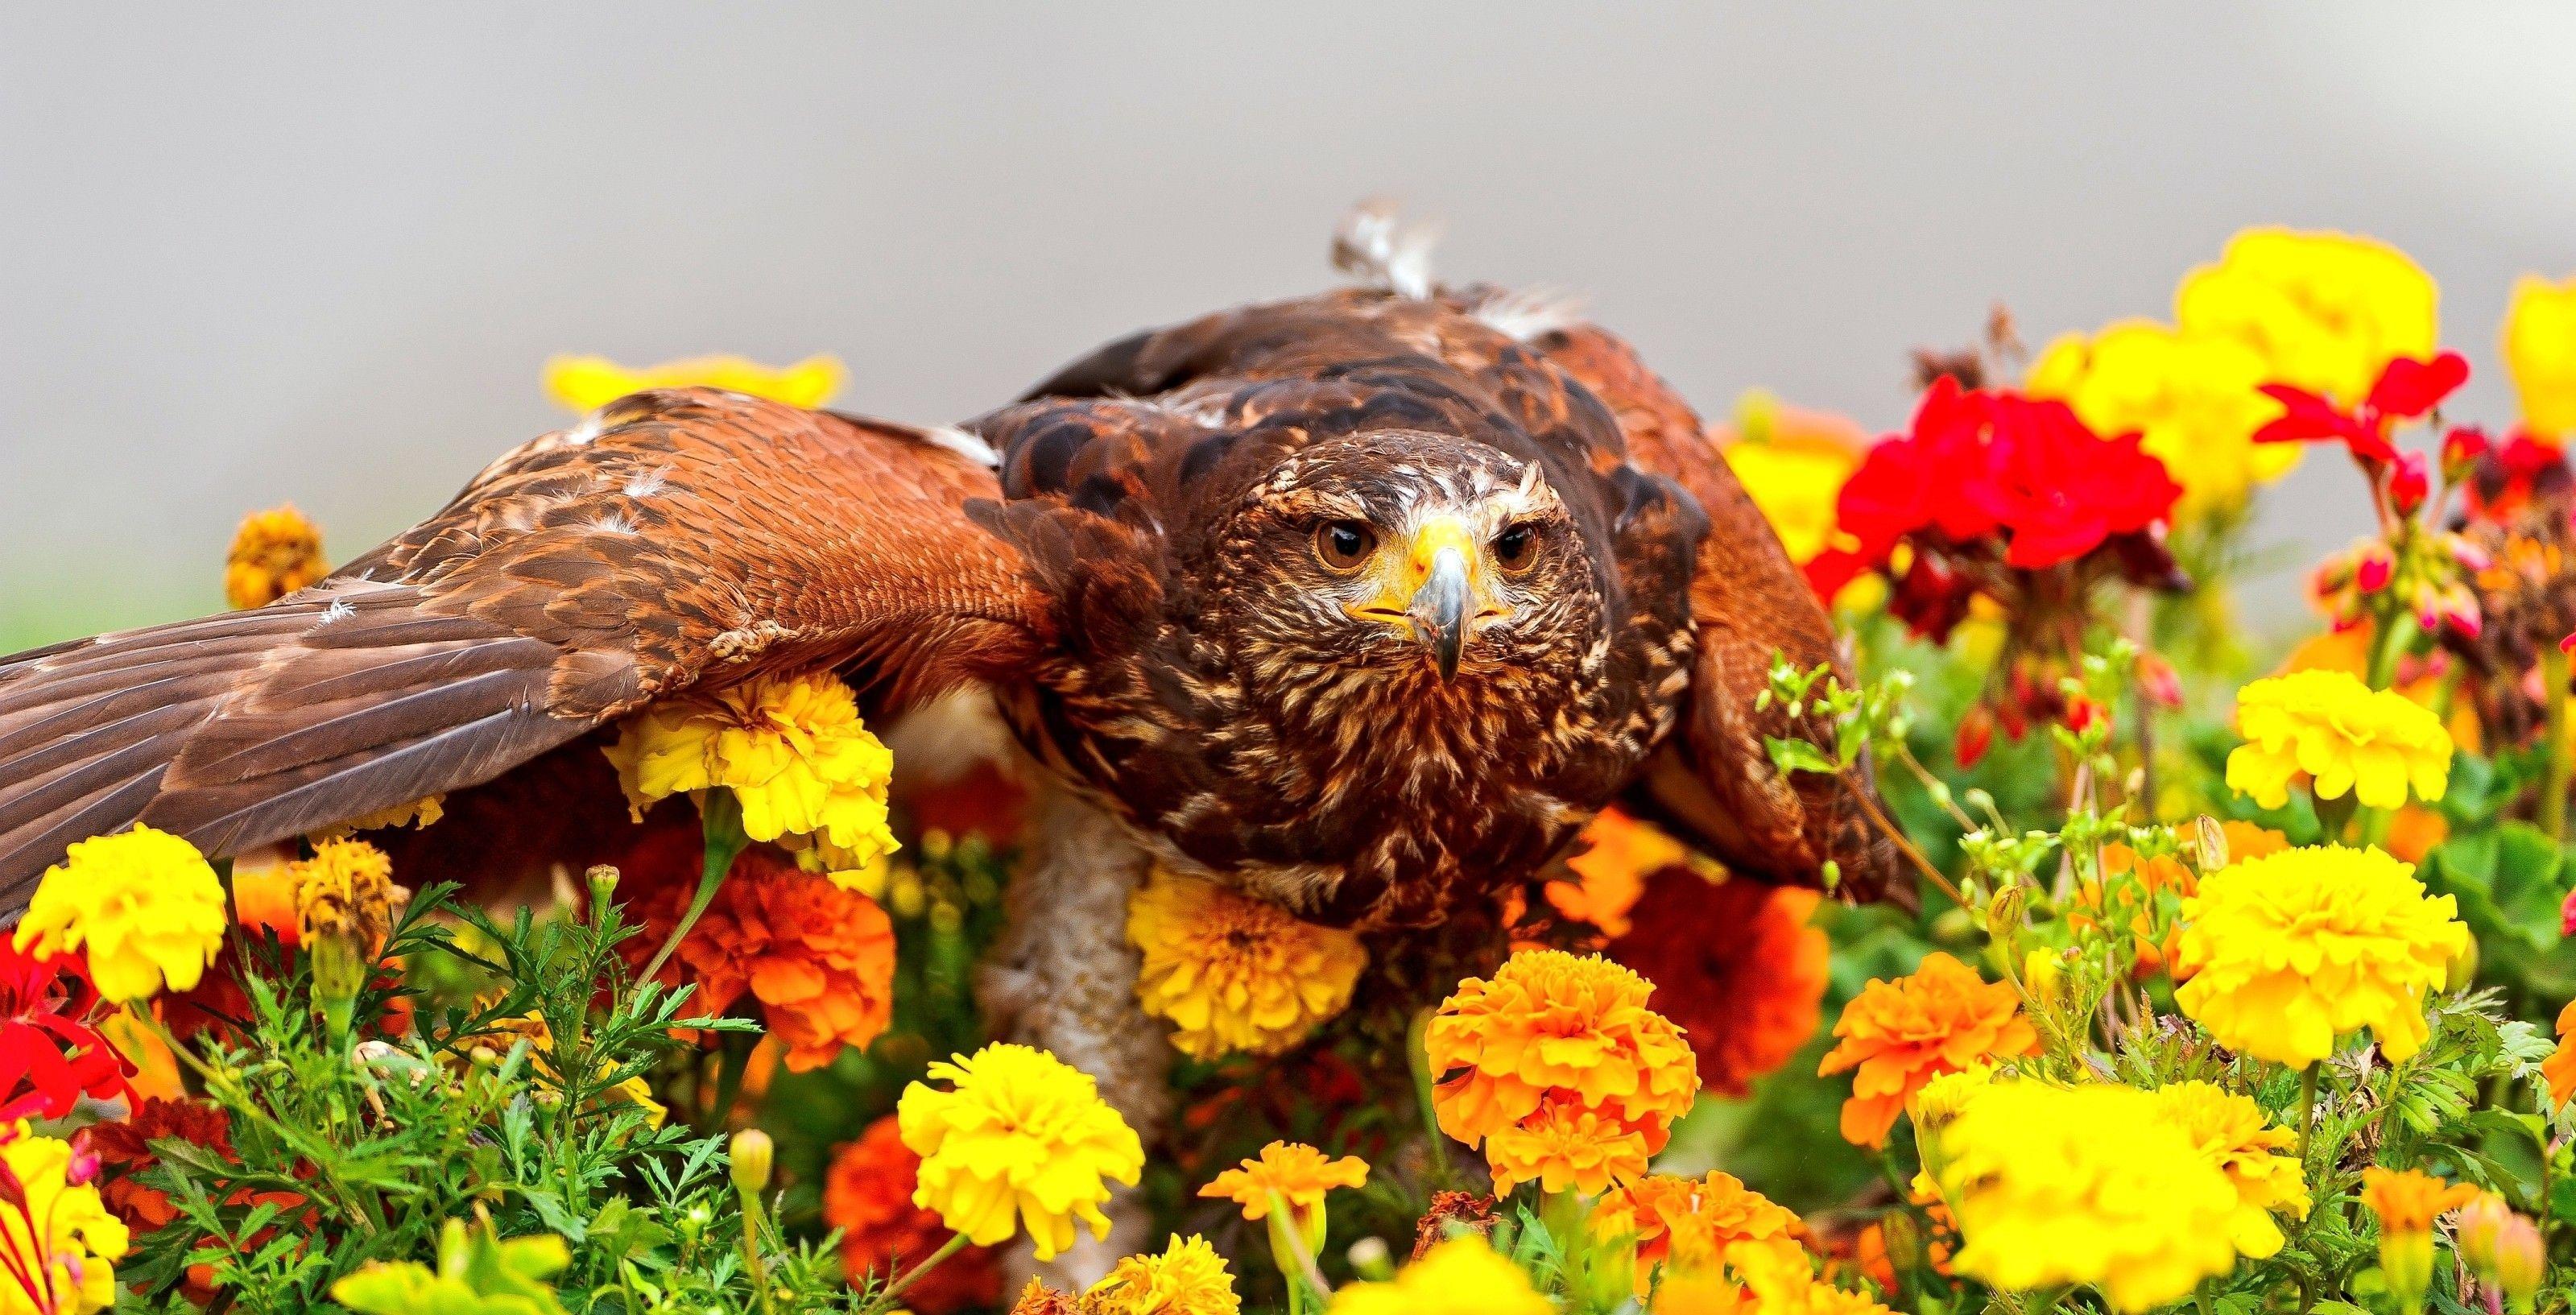 Photo Hawk bird flower Tagetes Animals 3199x1633 Birds Flowers animal